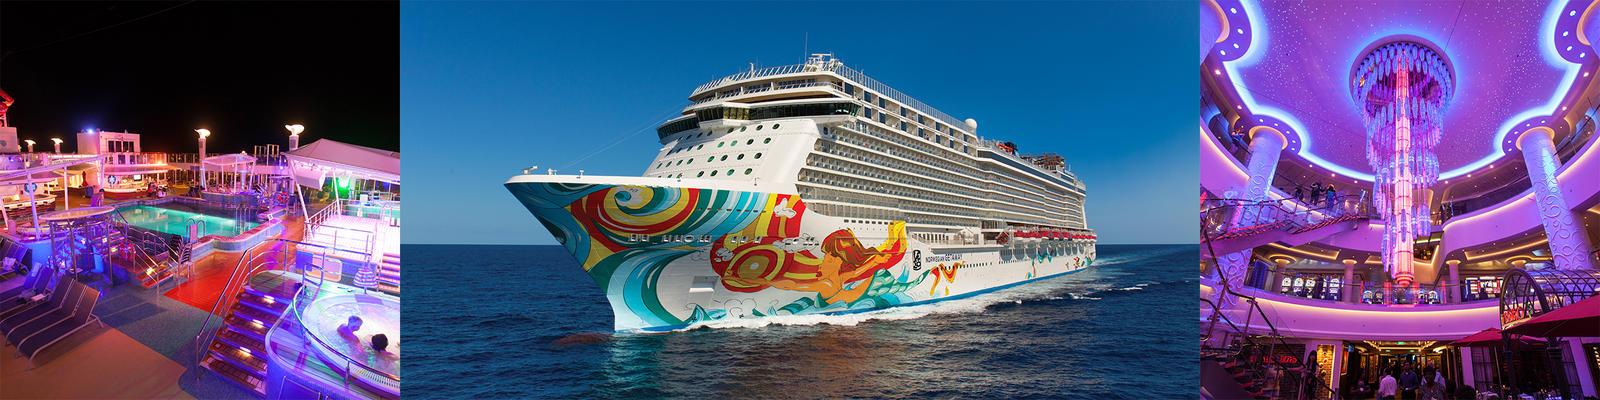 Norwegian Getaway Cruise Ship Review Photos Departure Ports On - Getaway cruise ship